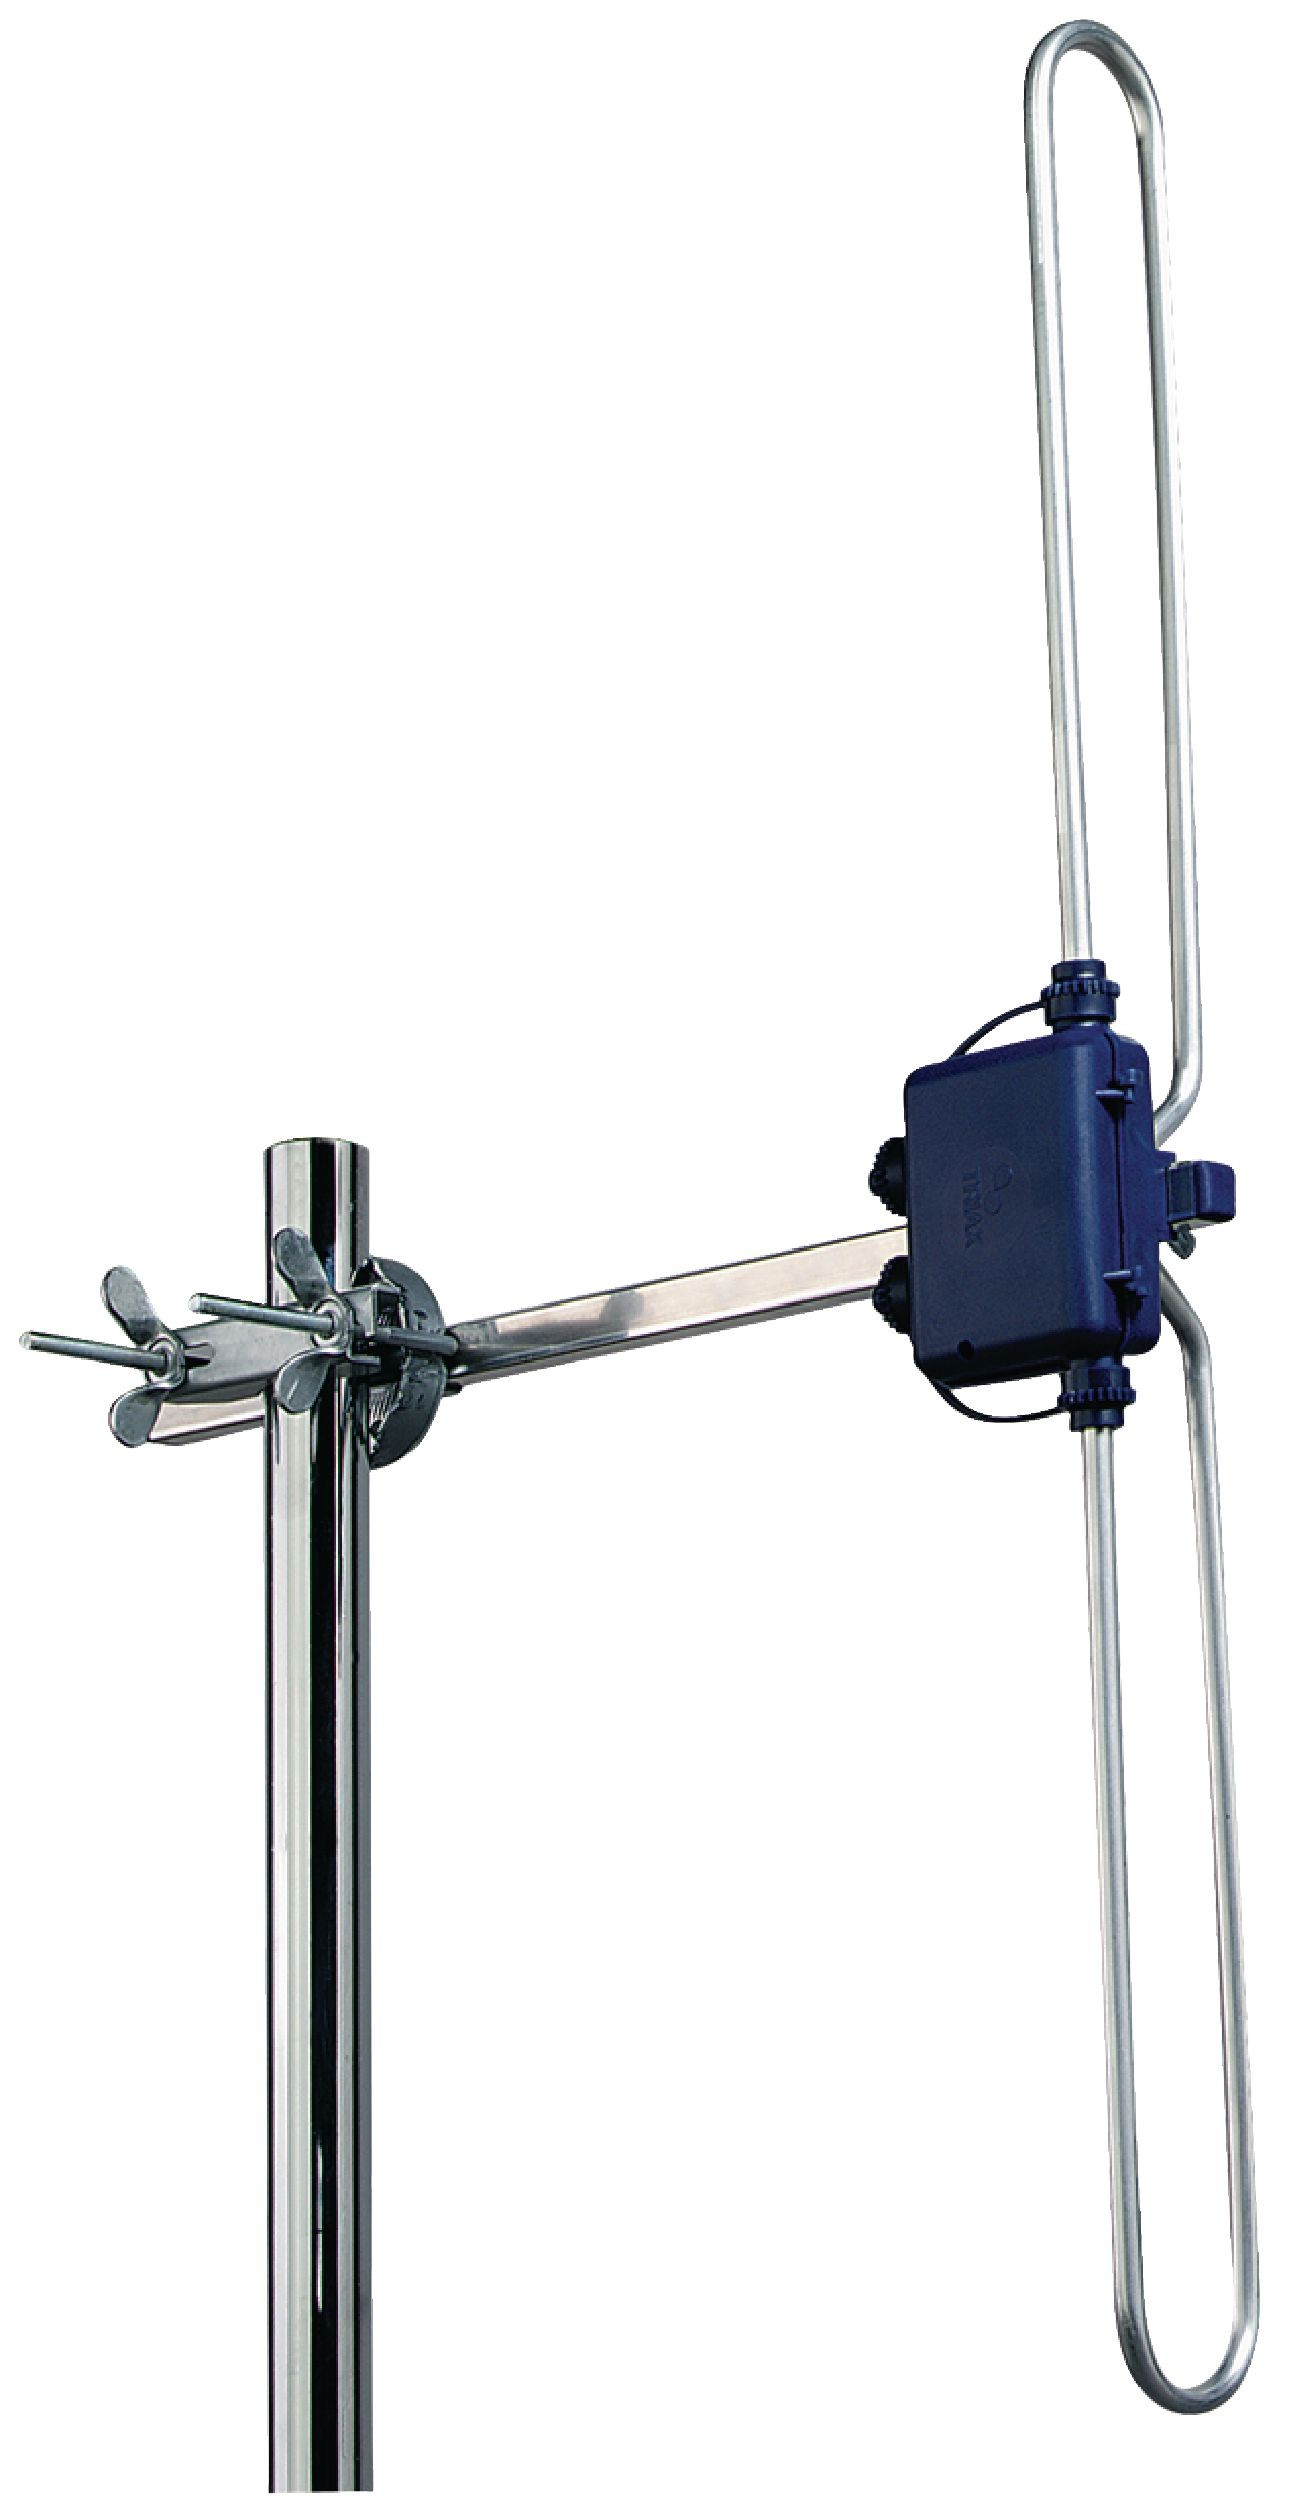 antenne dab dipool 174 240mhz antenne dvb t dab fm uhf. Black Bedroom Furniture Sets. Home Design Ideas